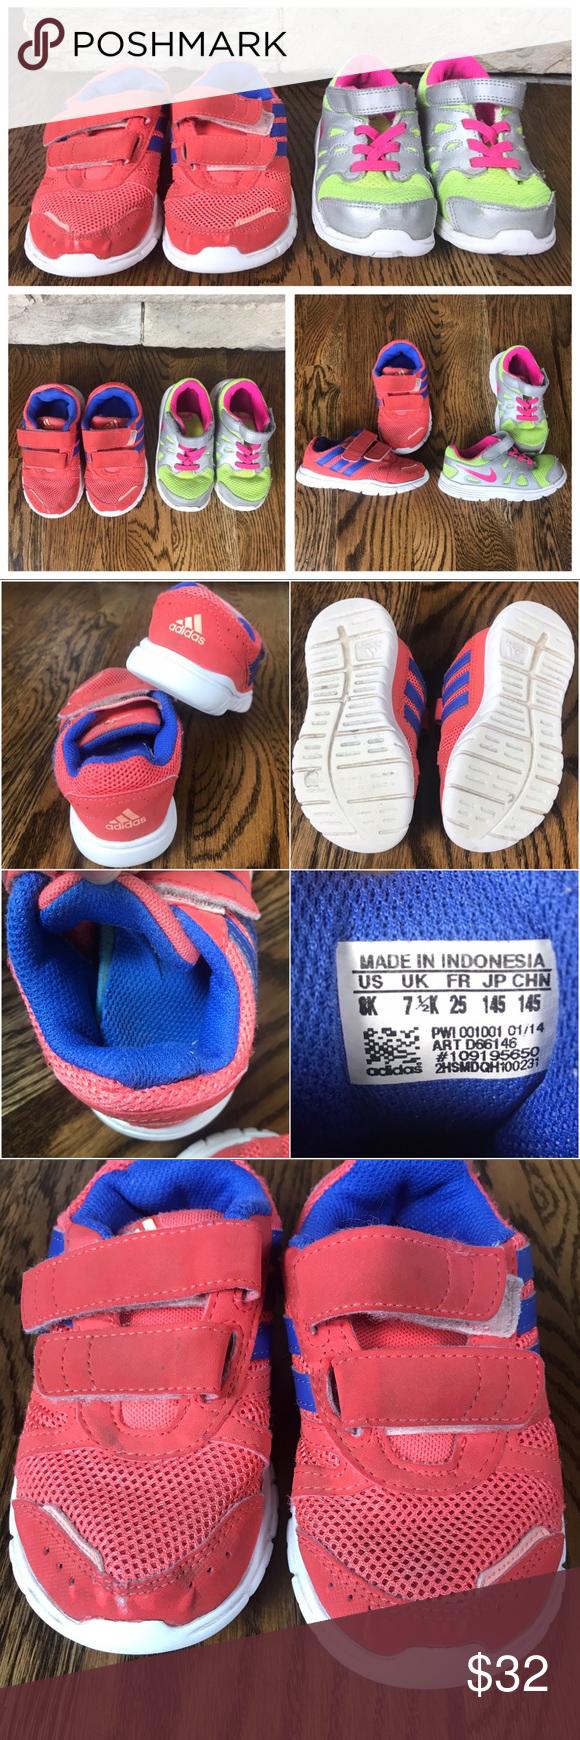 Toddler Adidas and Nike Size 8 Shoe